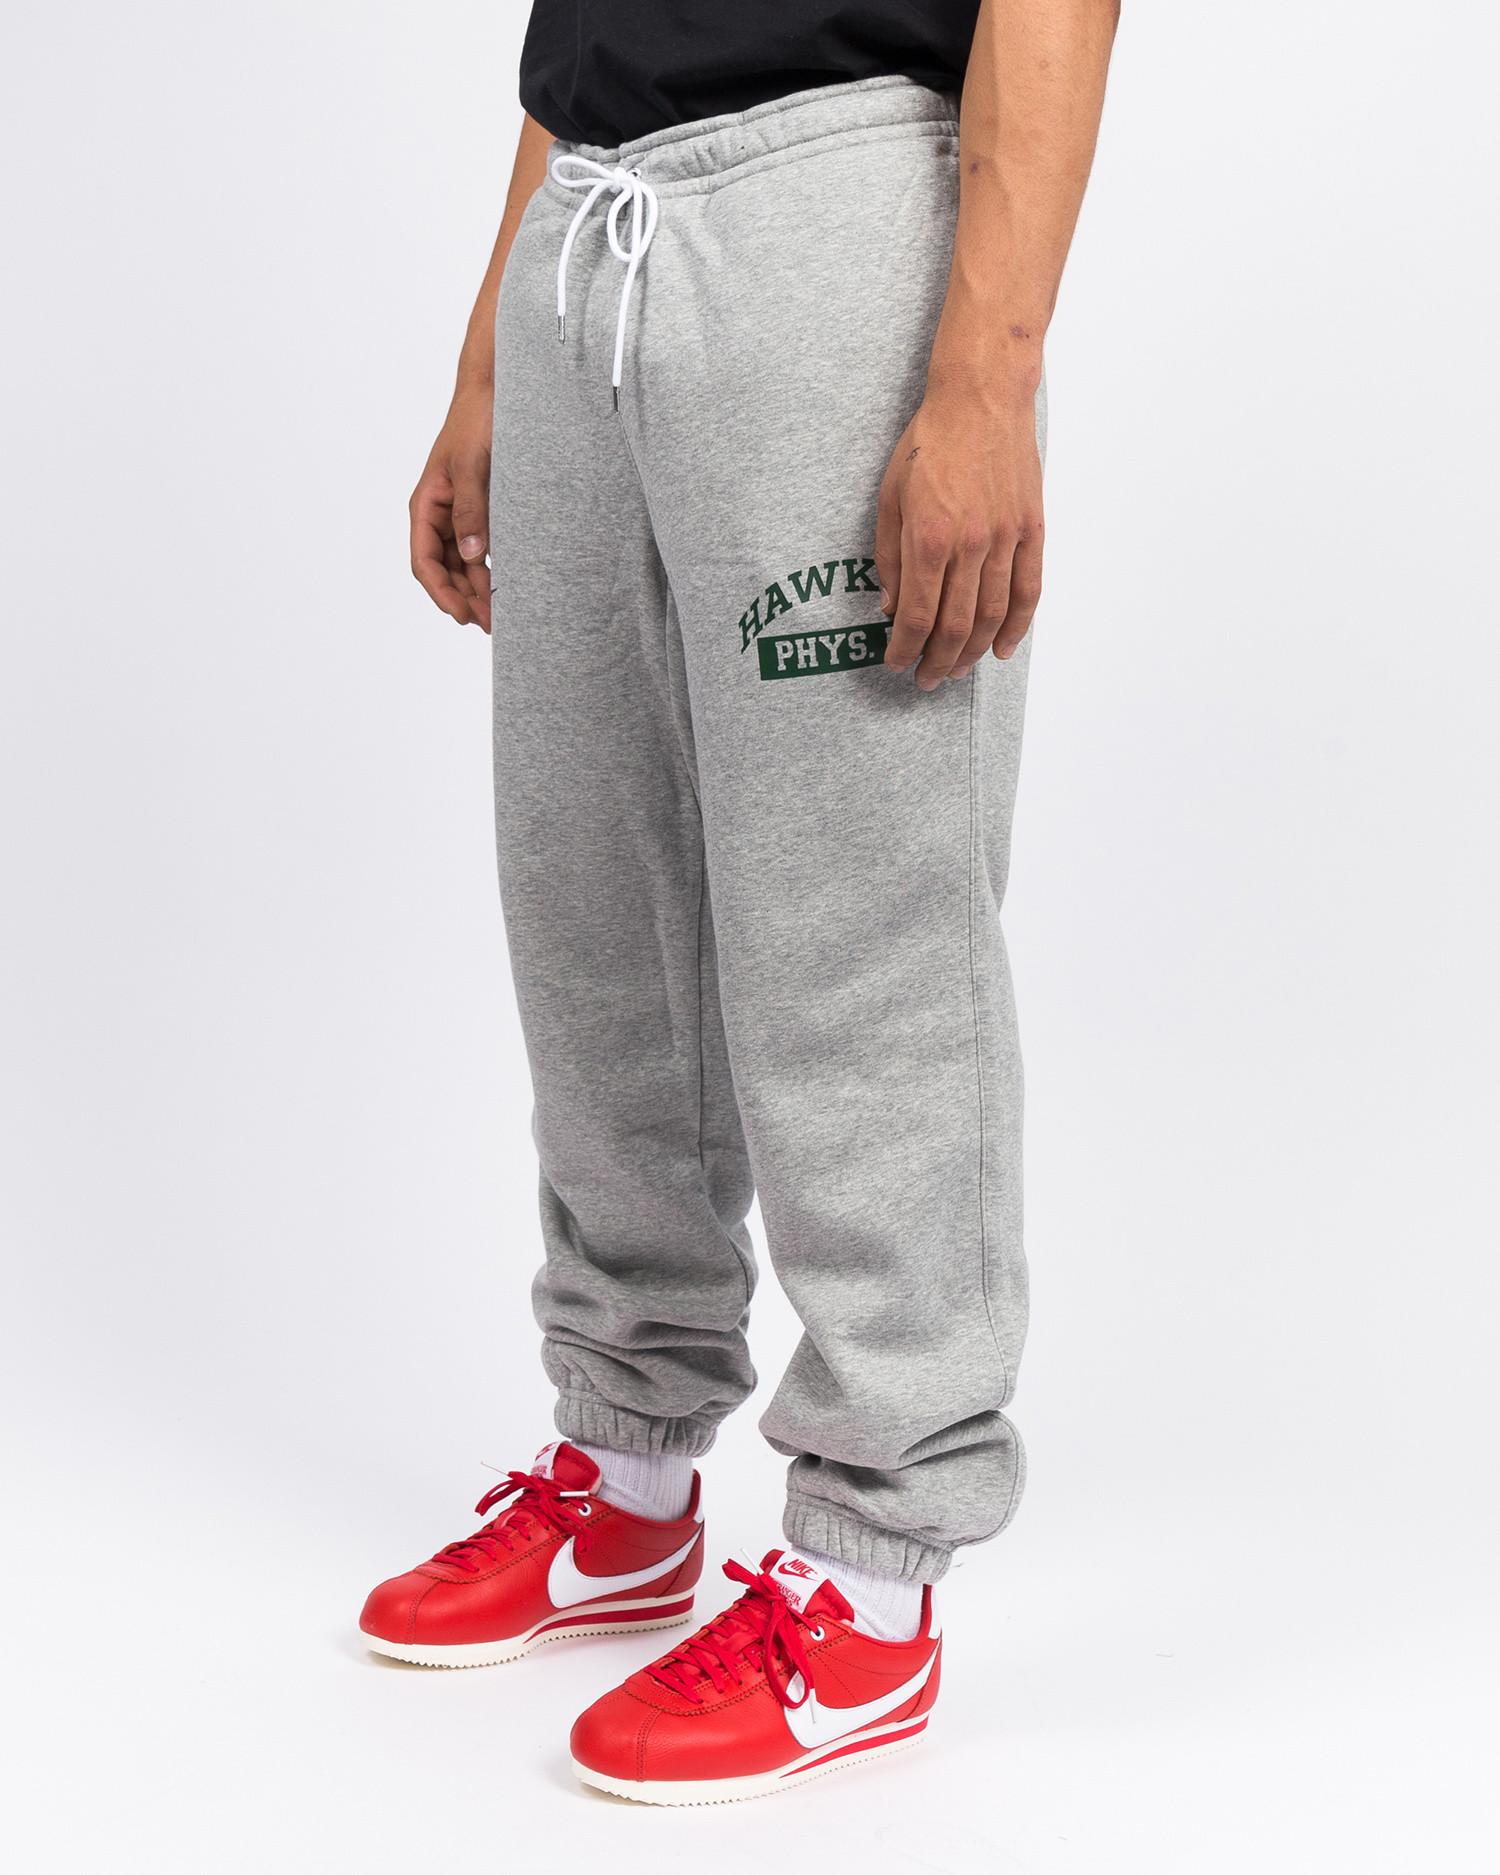 Nike M nrg club pant cf bb stranger things Dk grey heather/white/fir